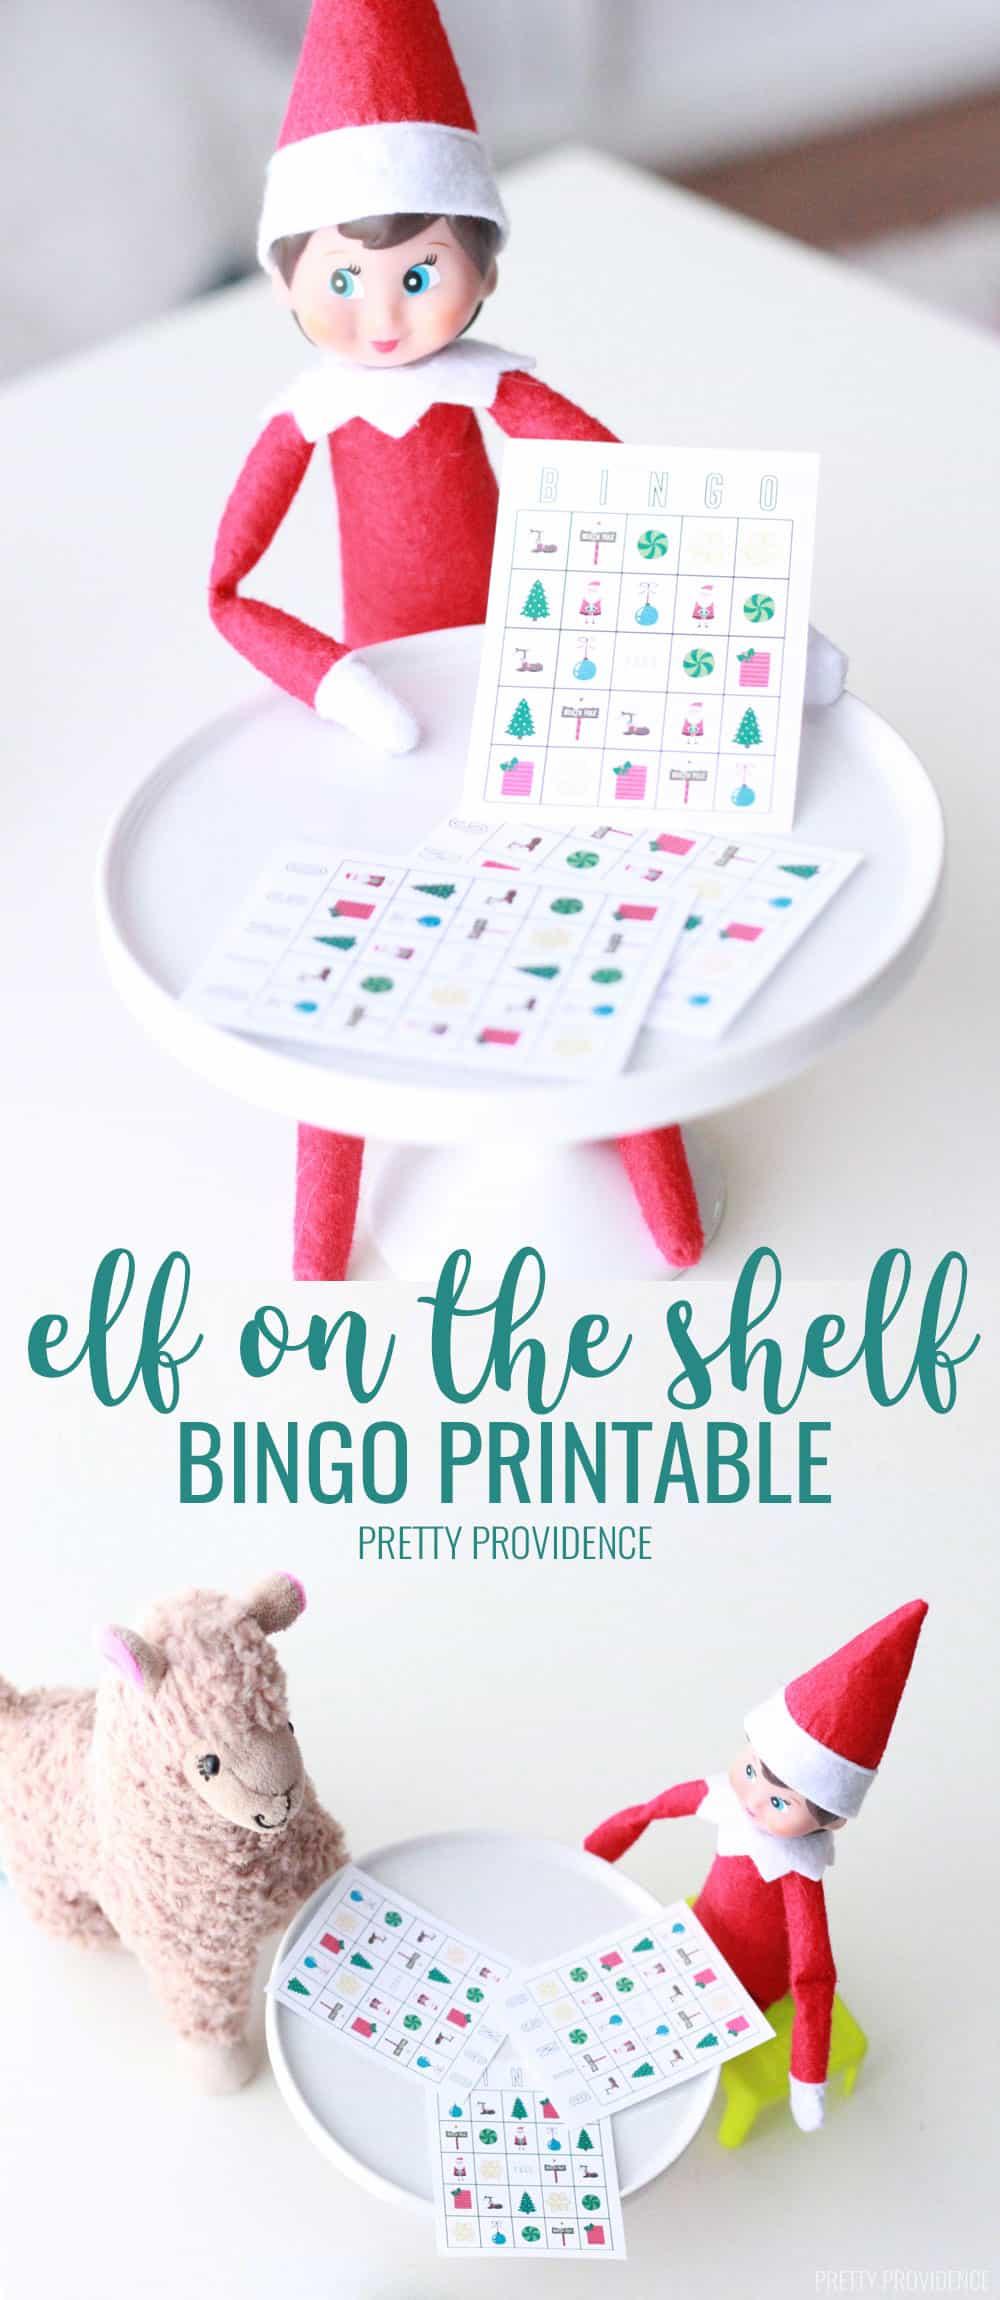 This Elf on the Shelf Bingo is a fun and easy Elf on the shelf idea. Print our Elf sized bingo and the regular size to play as a family! #elfontheshelf #elfontheshelfideas #kids #elf #printable #elfprintables #elfontheshelfprintable #elfontheshelfbingo #bingo #christmas #christmasbingo #christmasactivities #christmasideas #kidsideas